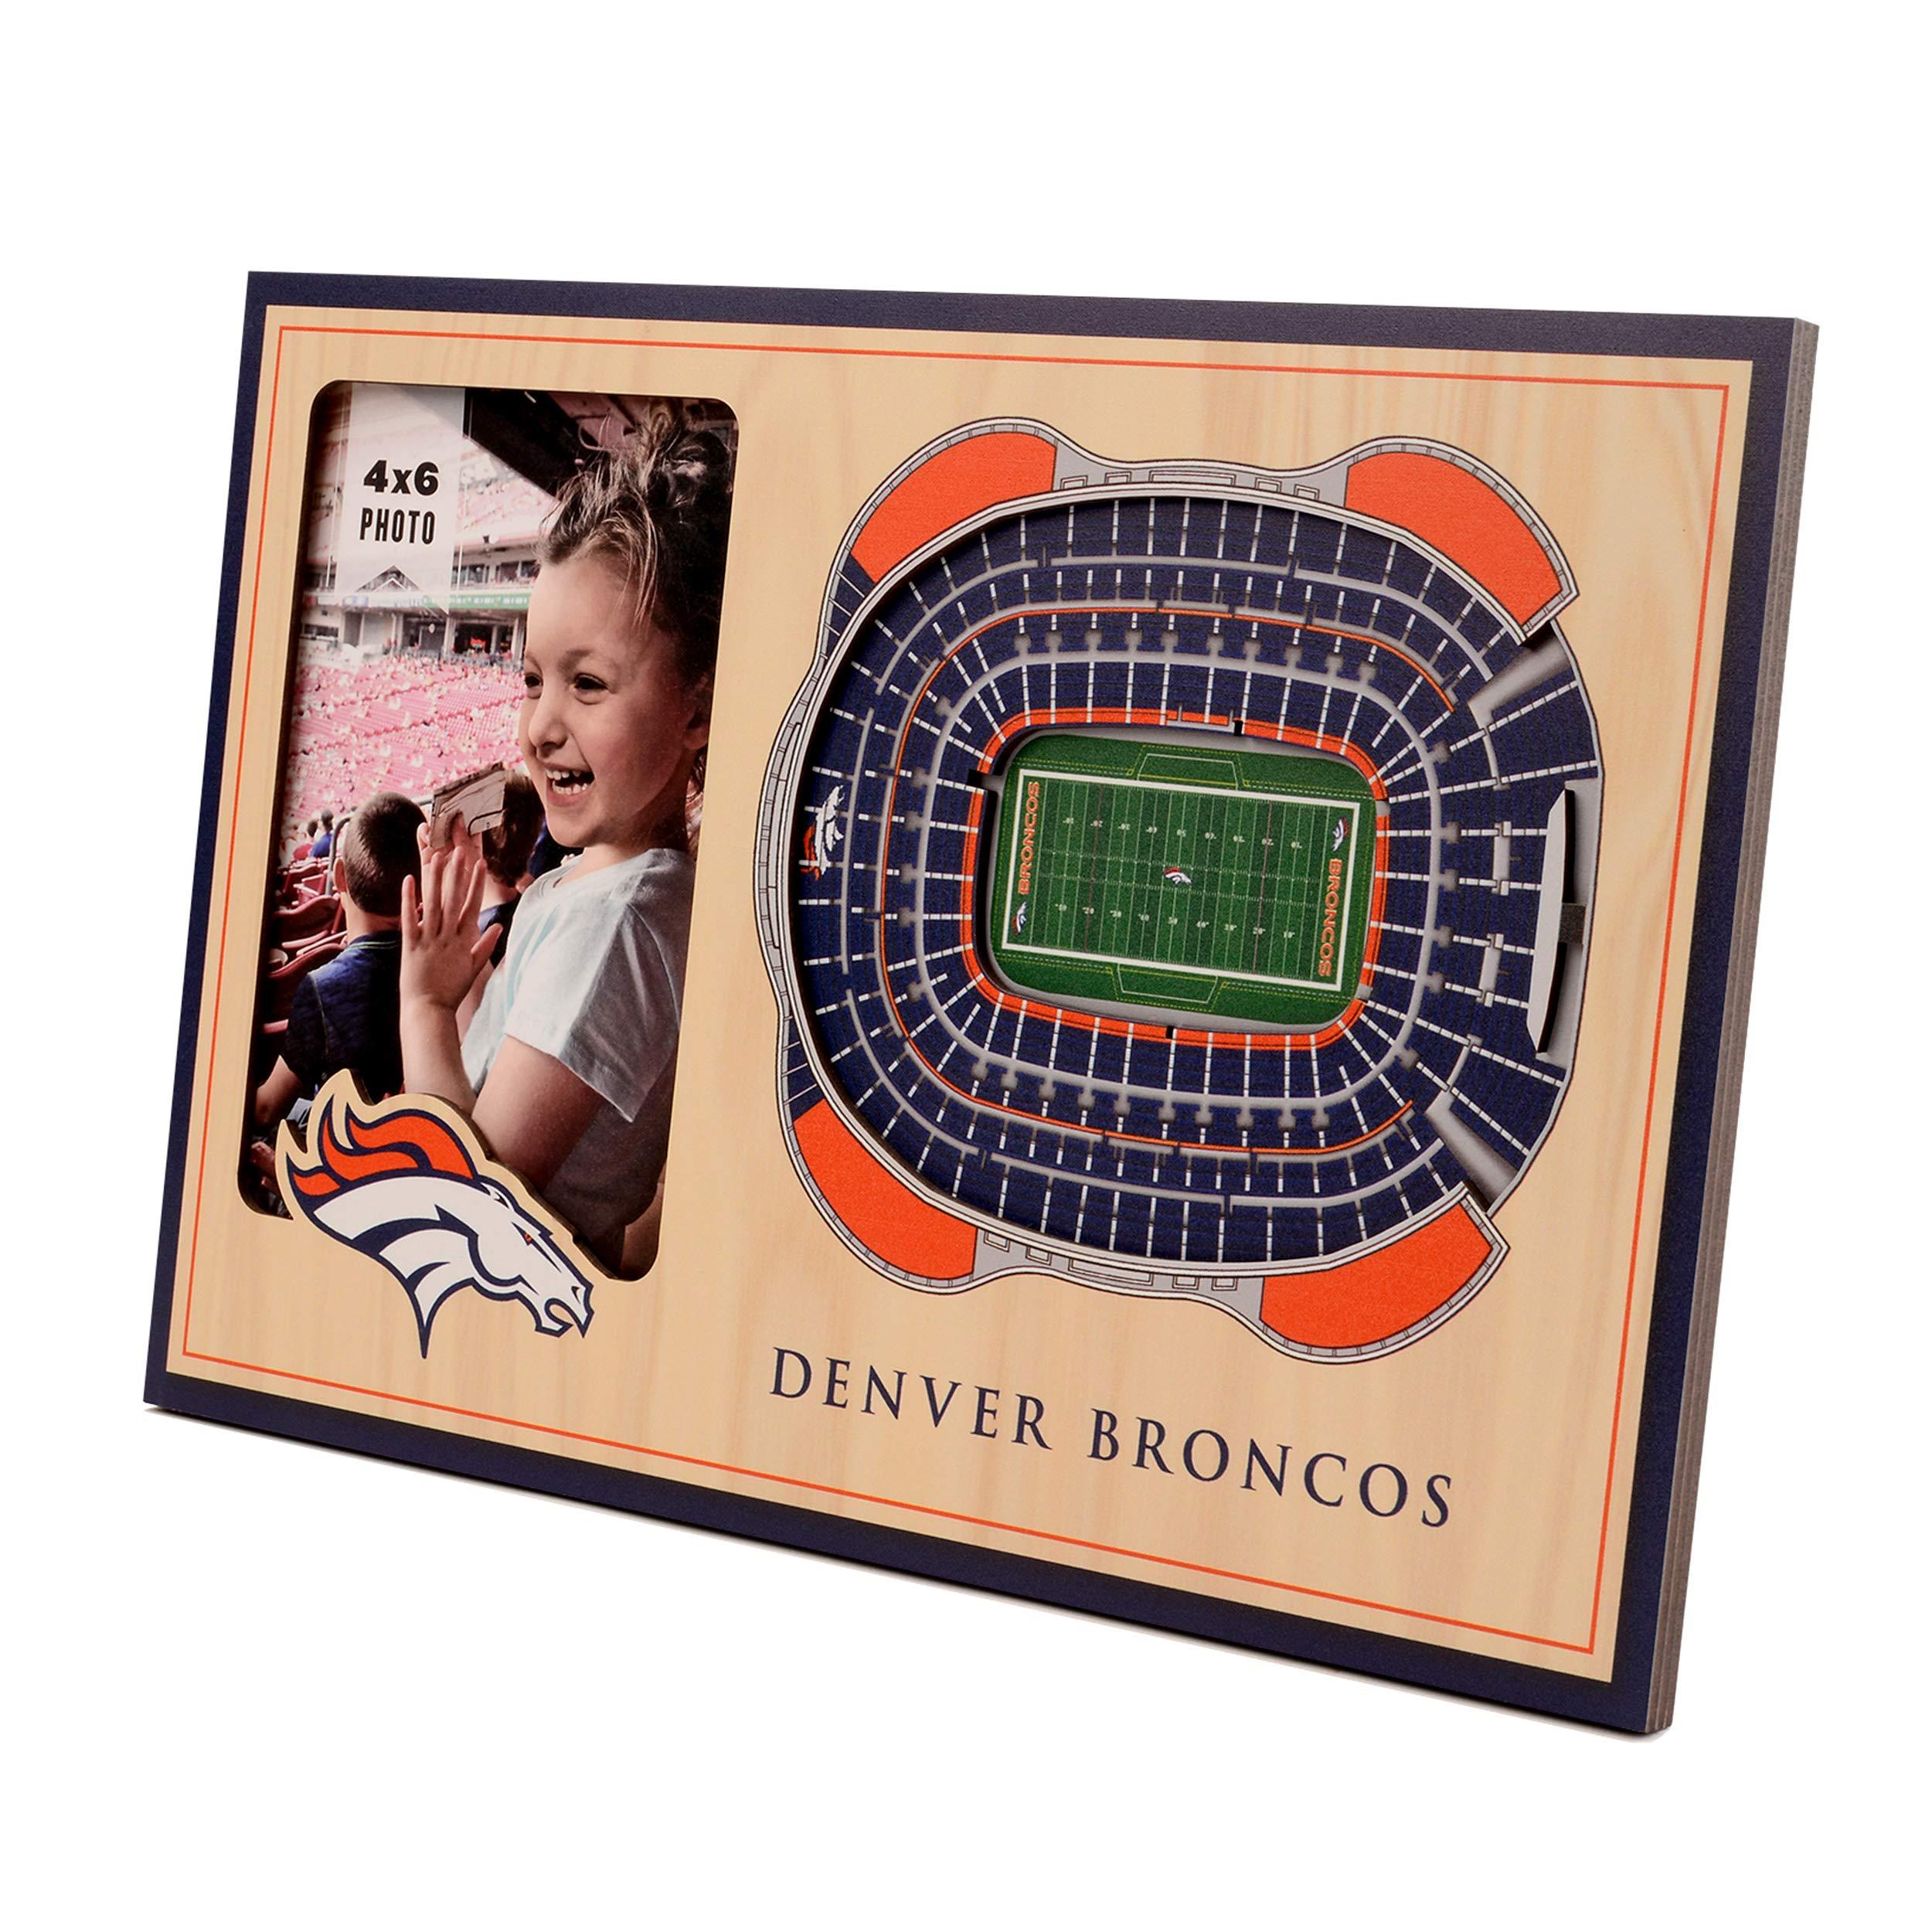 NFL Denver Broncos 3D StadiumViews Picture Frame by YouTheFan